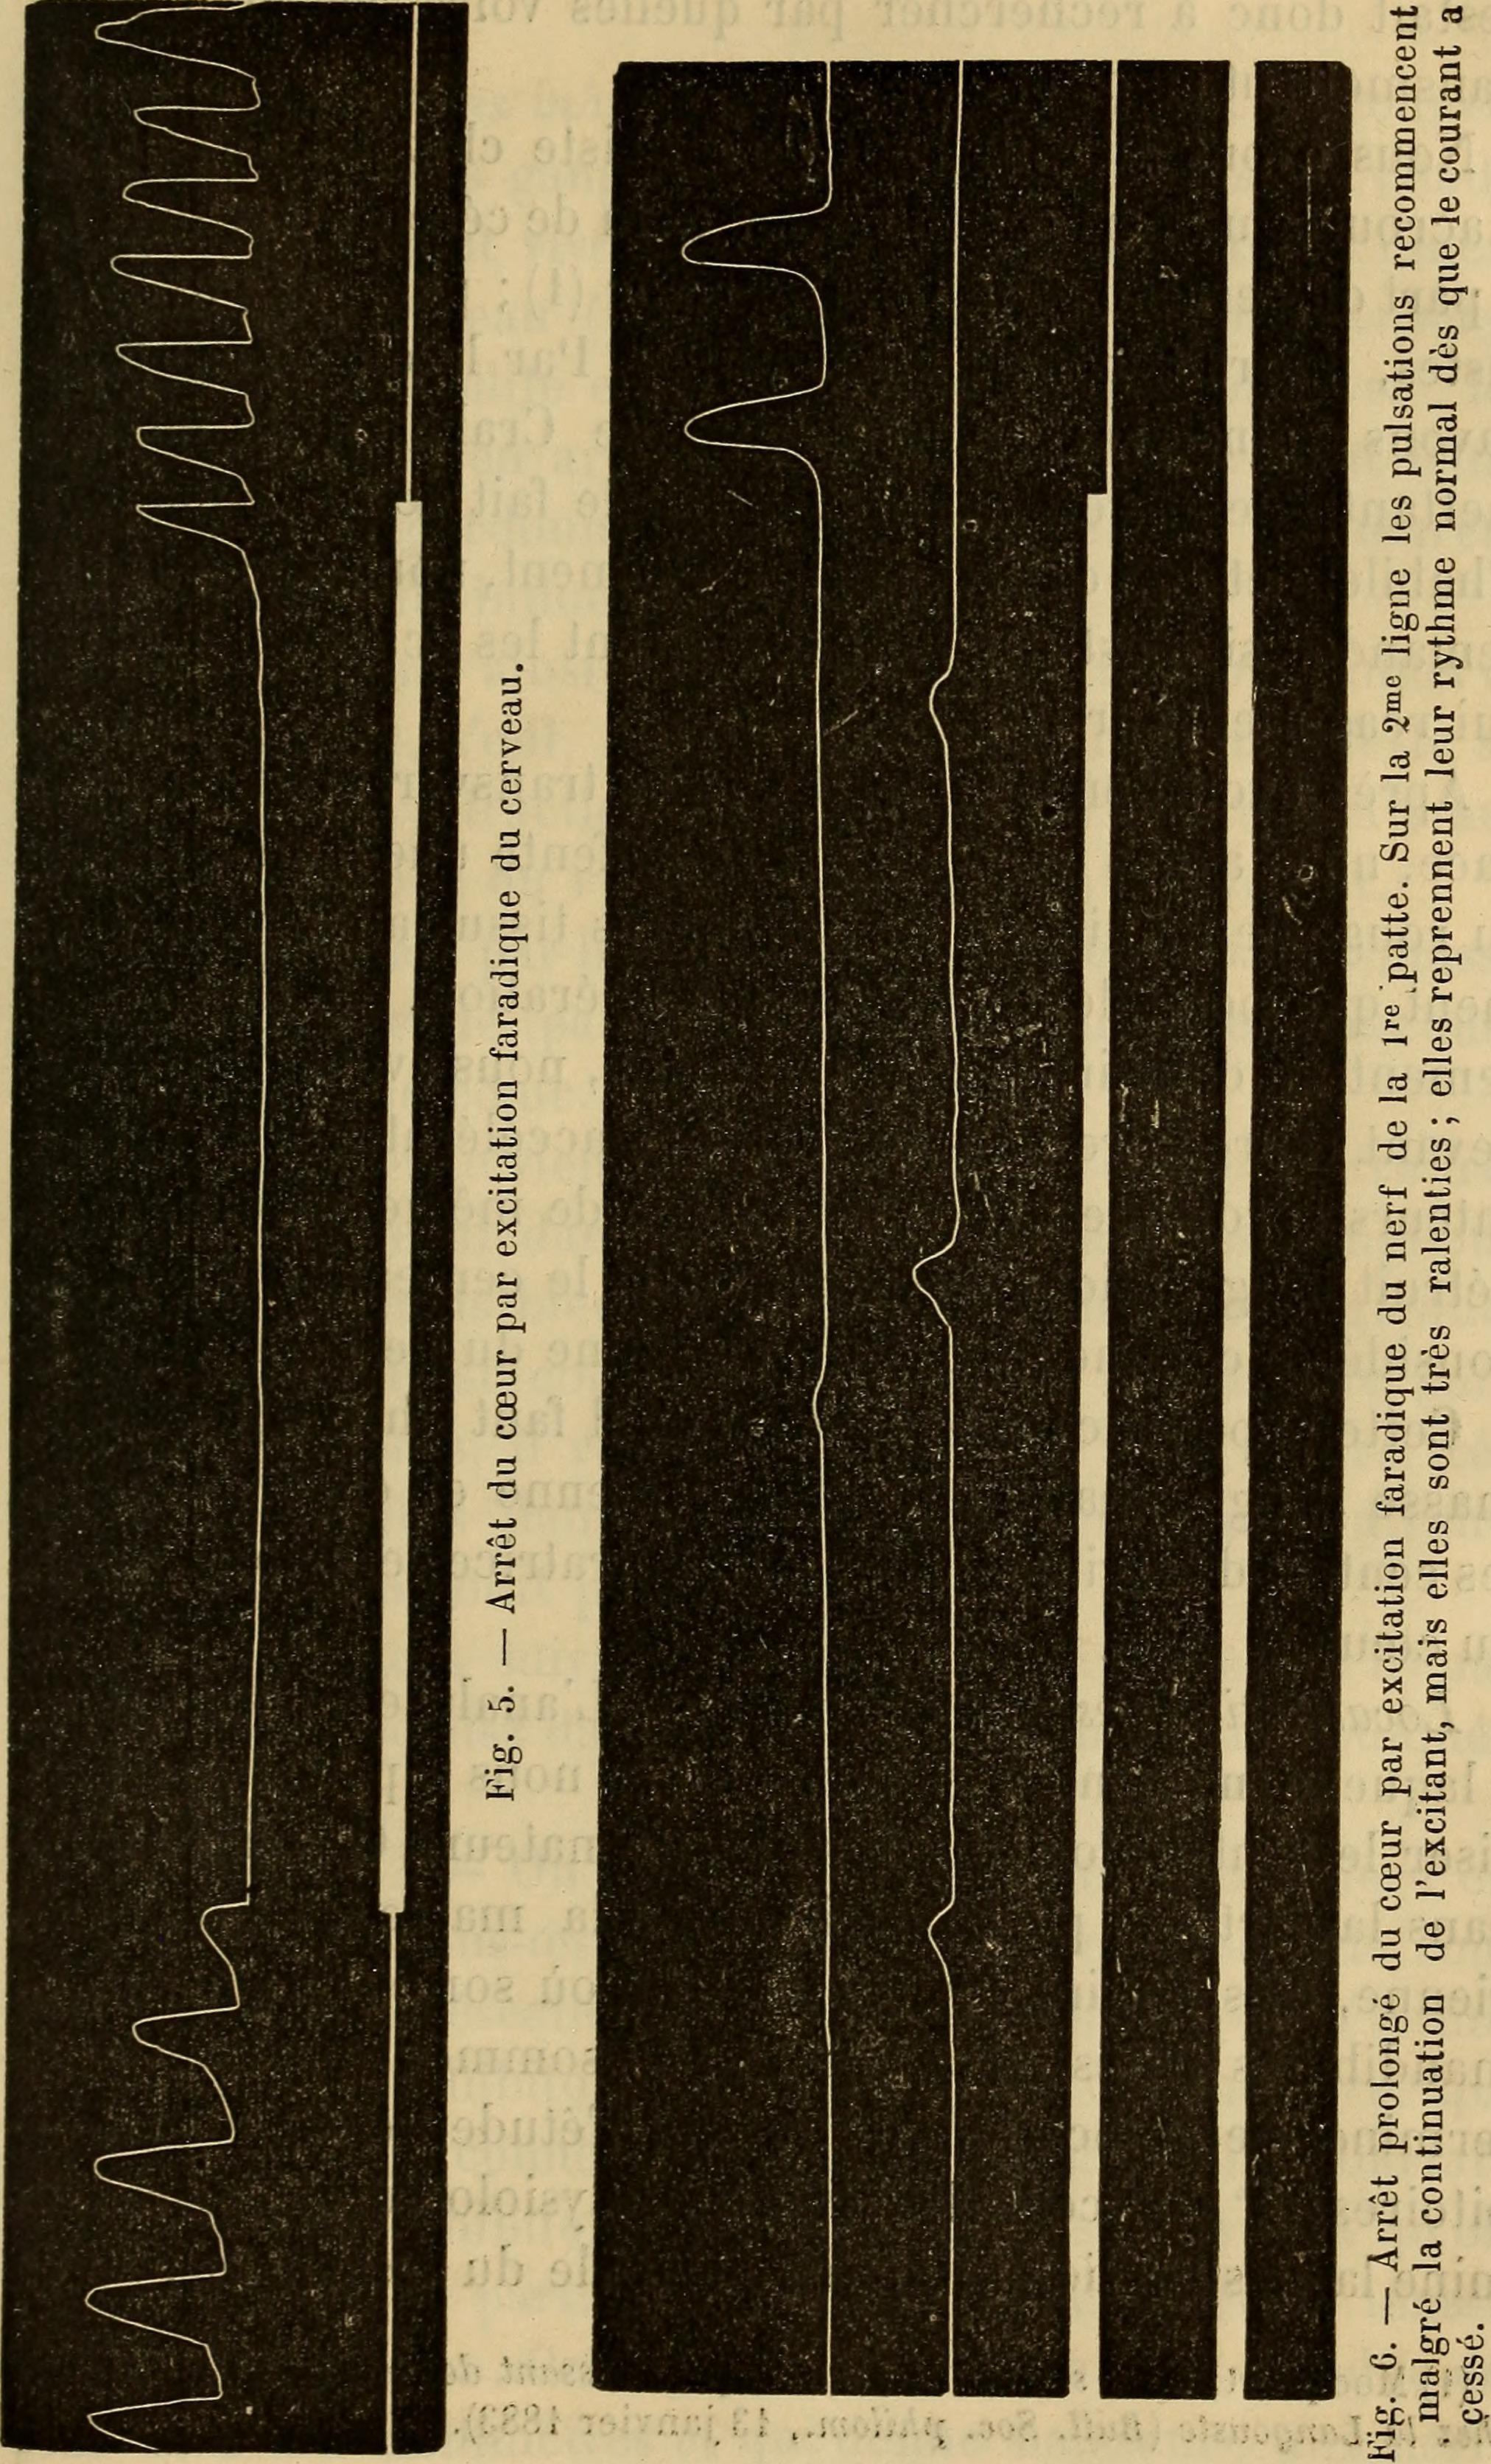 By Milne-Edwards, H. (Henri), 1800-1885;Audouin, Jean Victor, 1797-1841; Milne-Edwards, Alphonse, 1835-1900; Perrier, Edmond, 1844-1921; Bouvier, E.-L., 1856-1944;Grassé, Pierre Paul, 1895- [No restrictions], via Wikimedia Commons